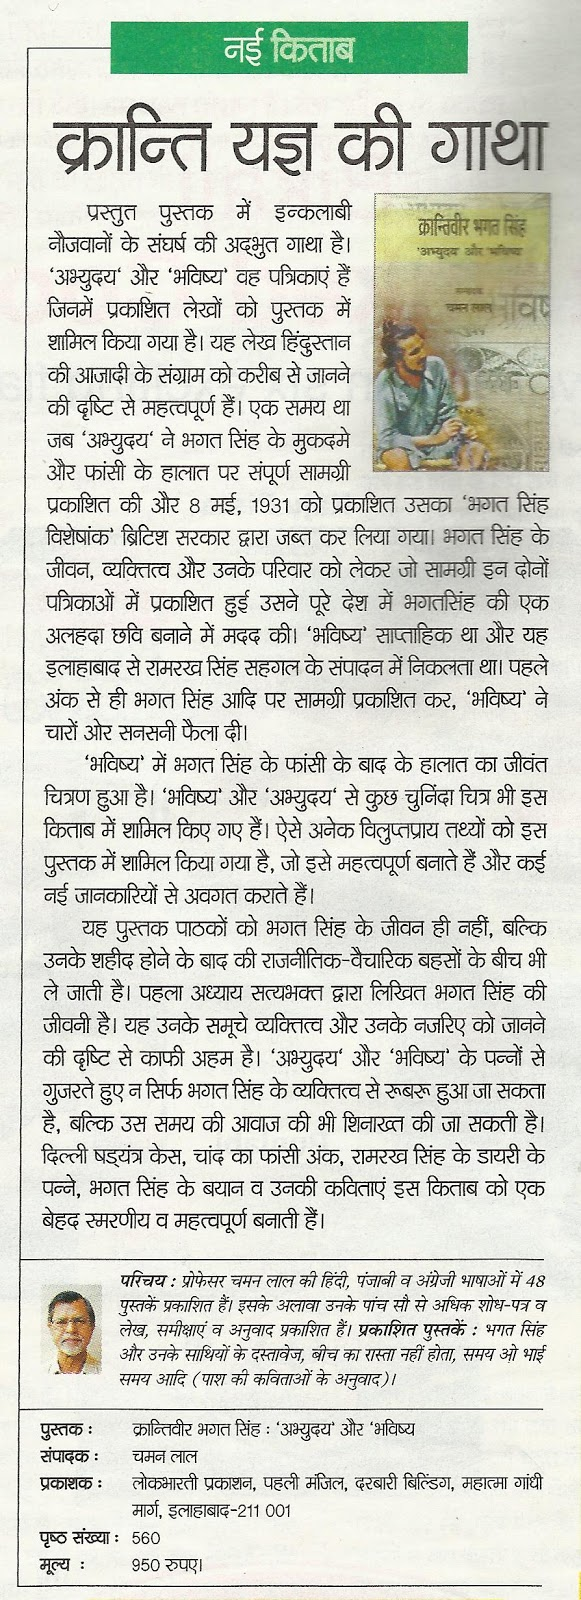 vidyarthi anushasan essay Vidyarthi jeevan aur anushasan essay publicado en febrero 13, 2018 por en sin categoría so stressed about this research paper feedback essay.